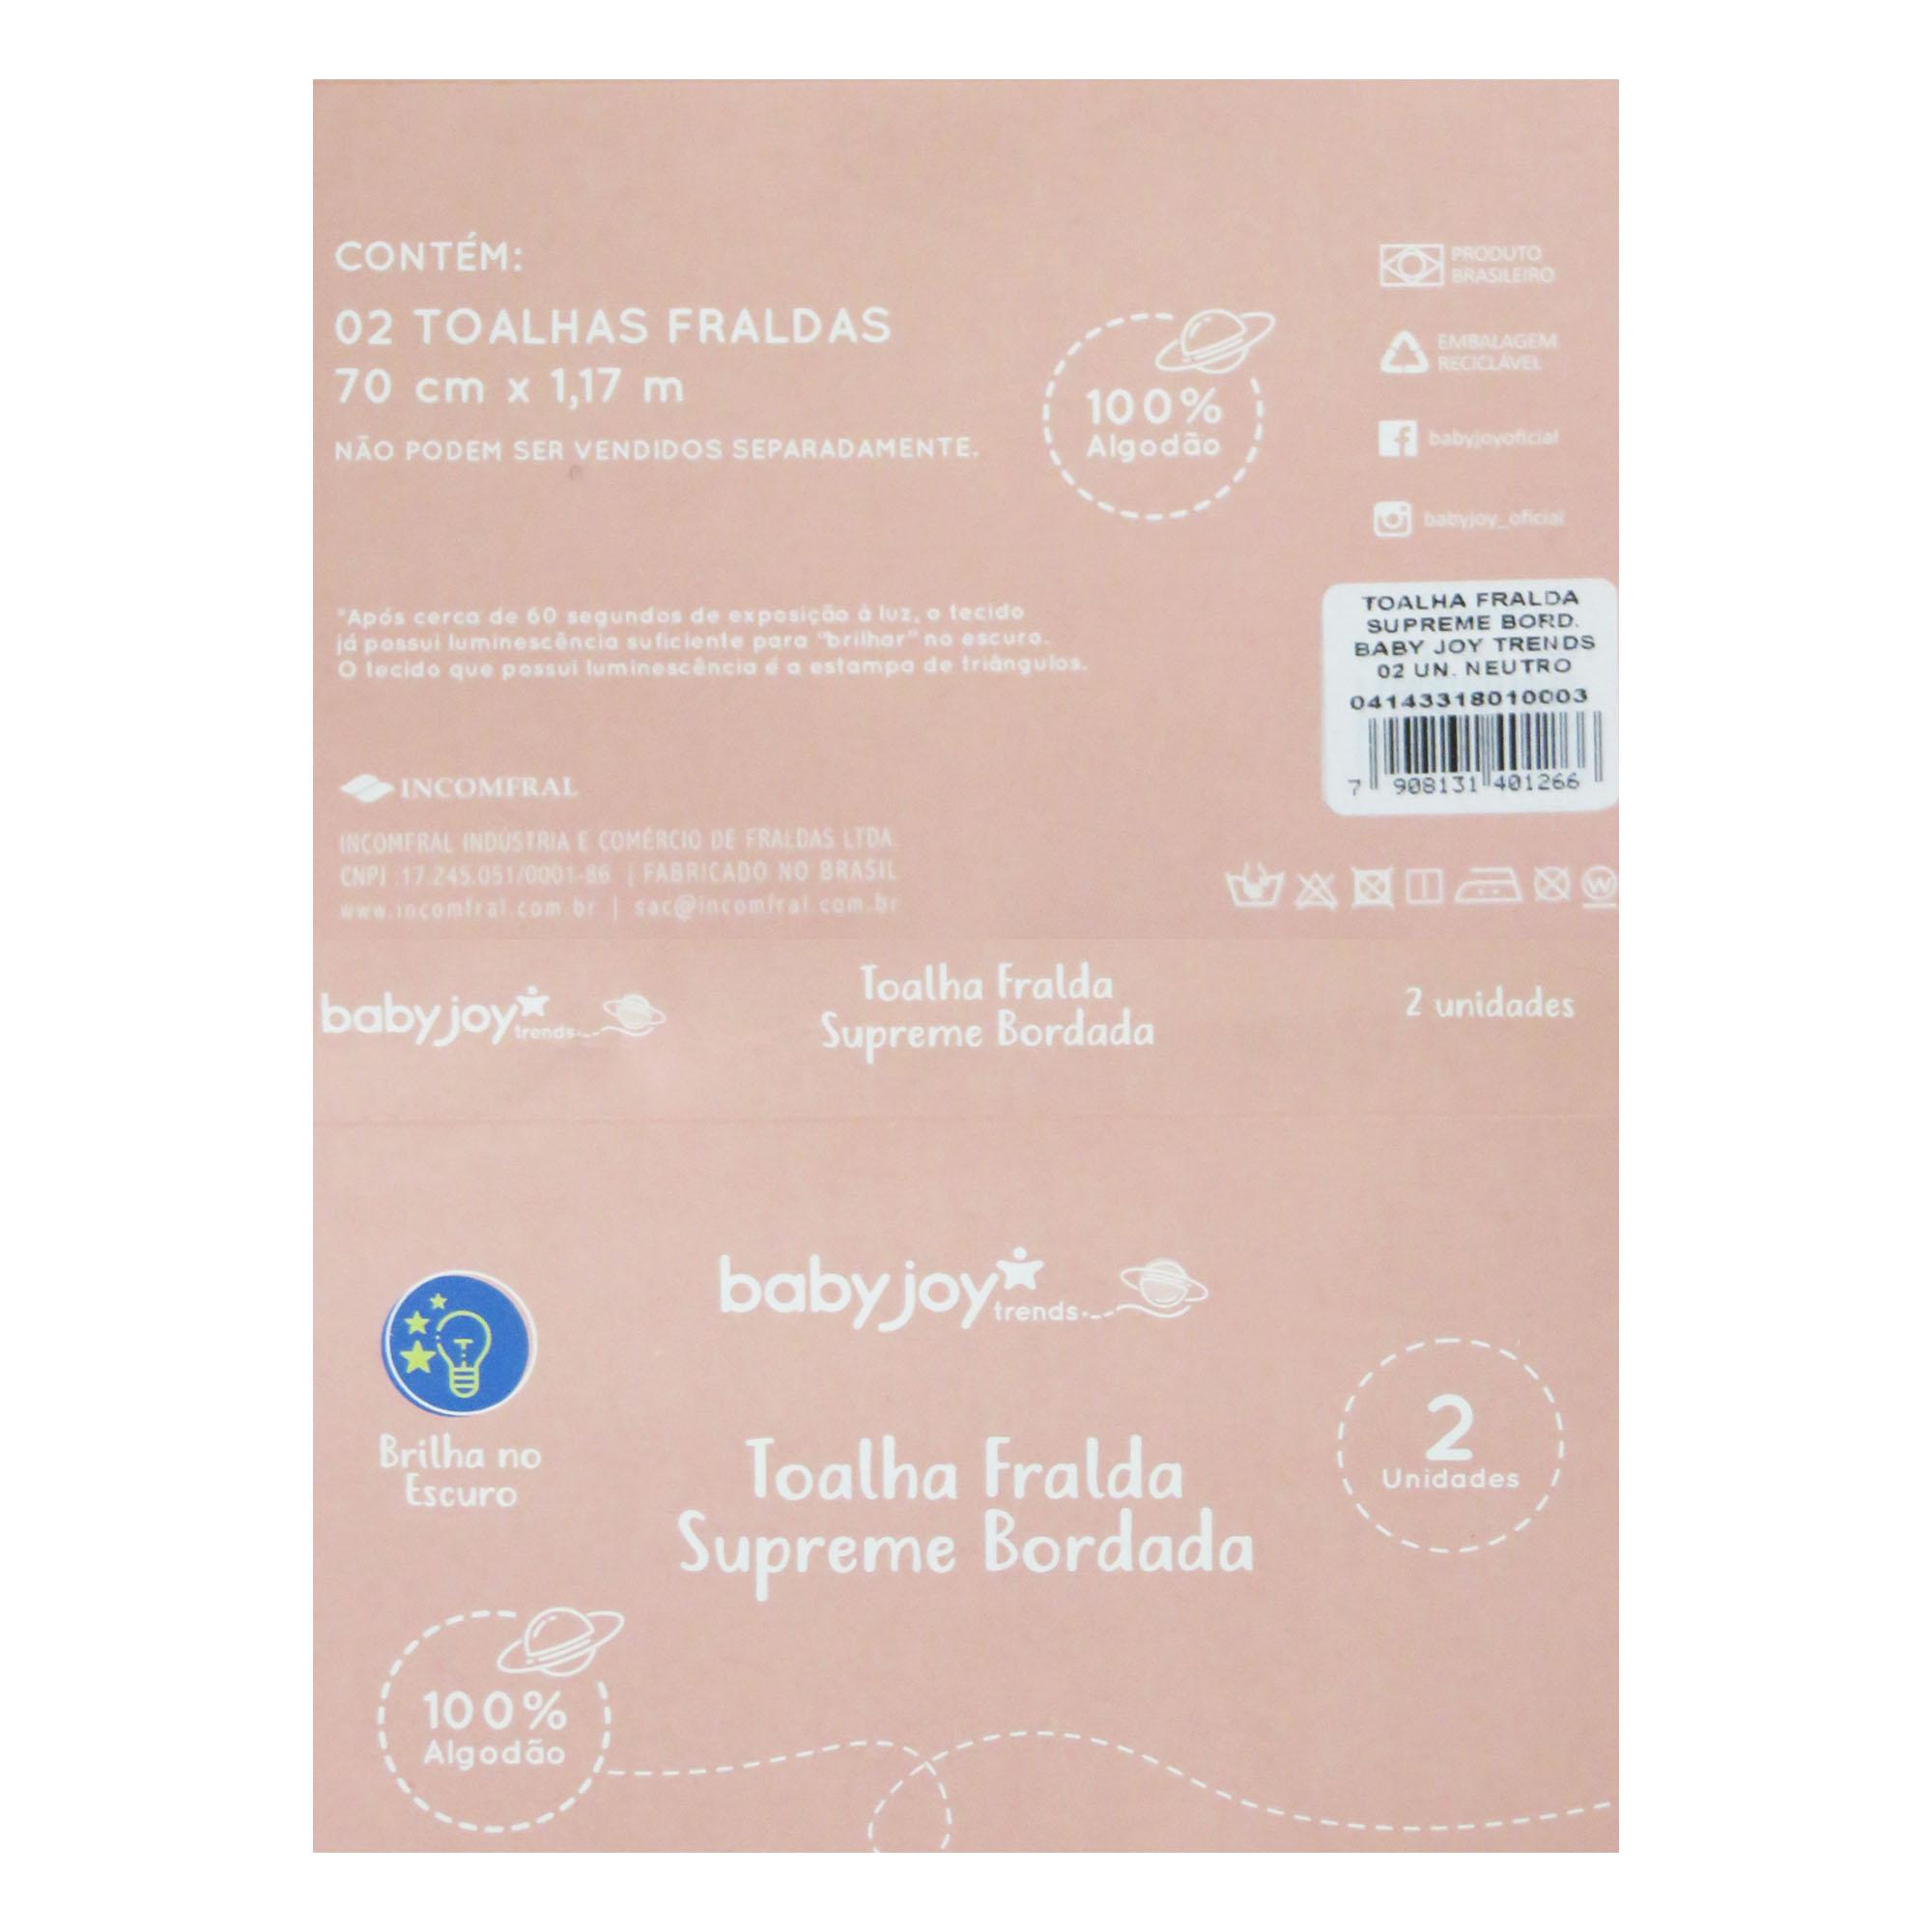 Toalha Fralda Supreme Bordada - Incomfral - BabyJoy Trends